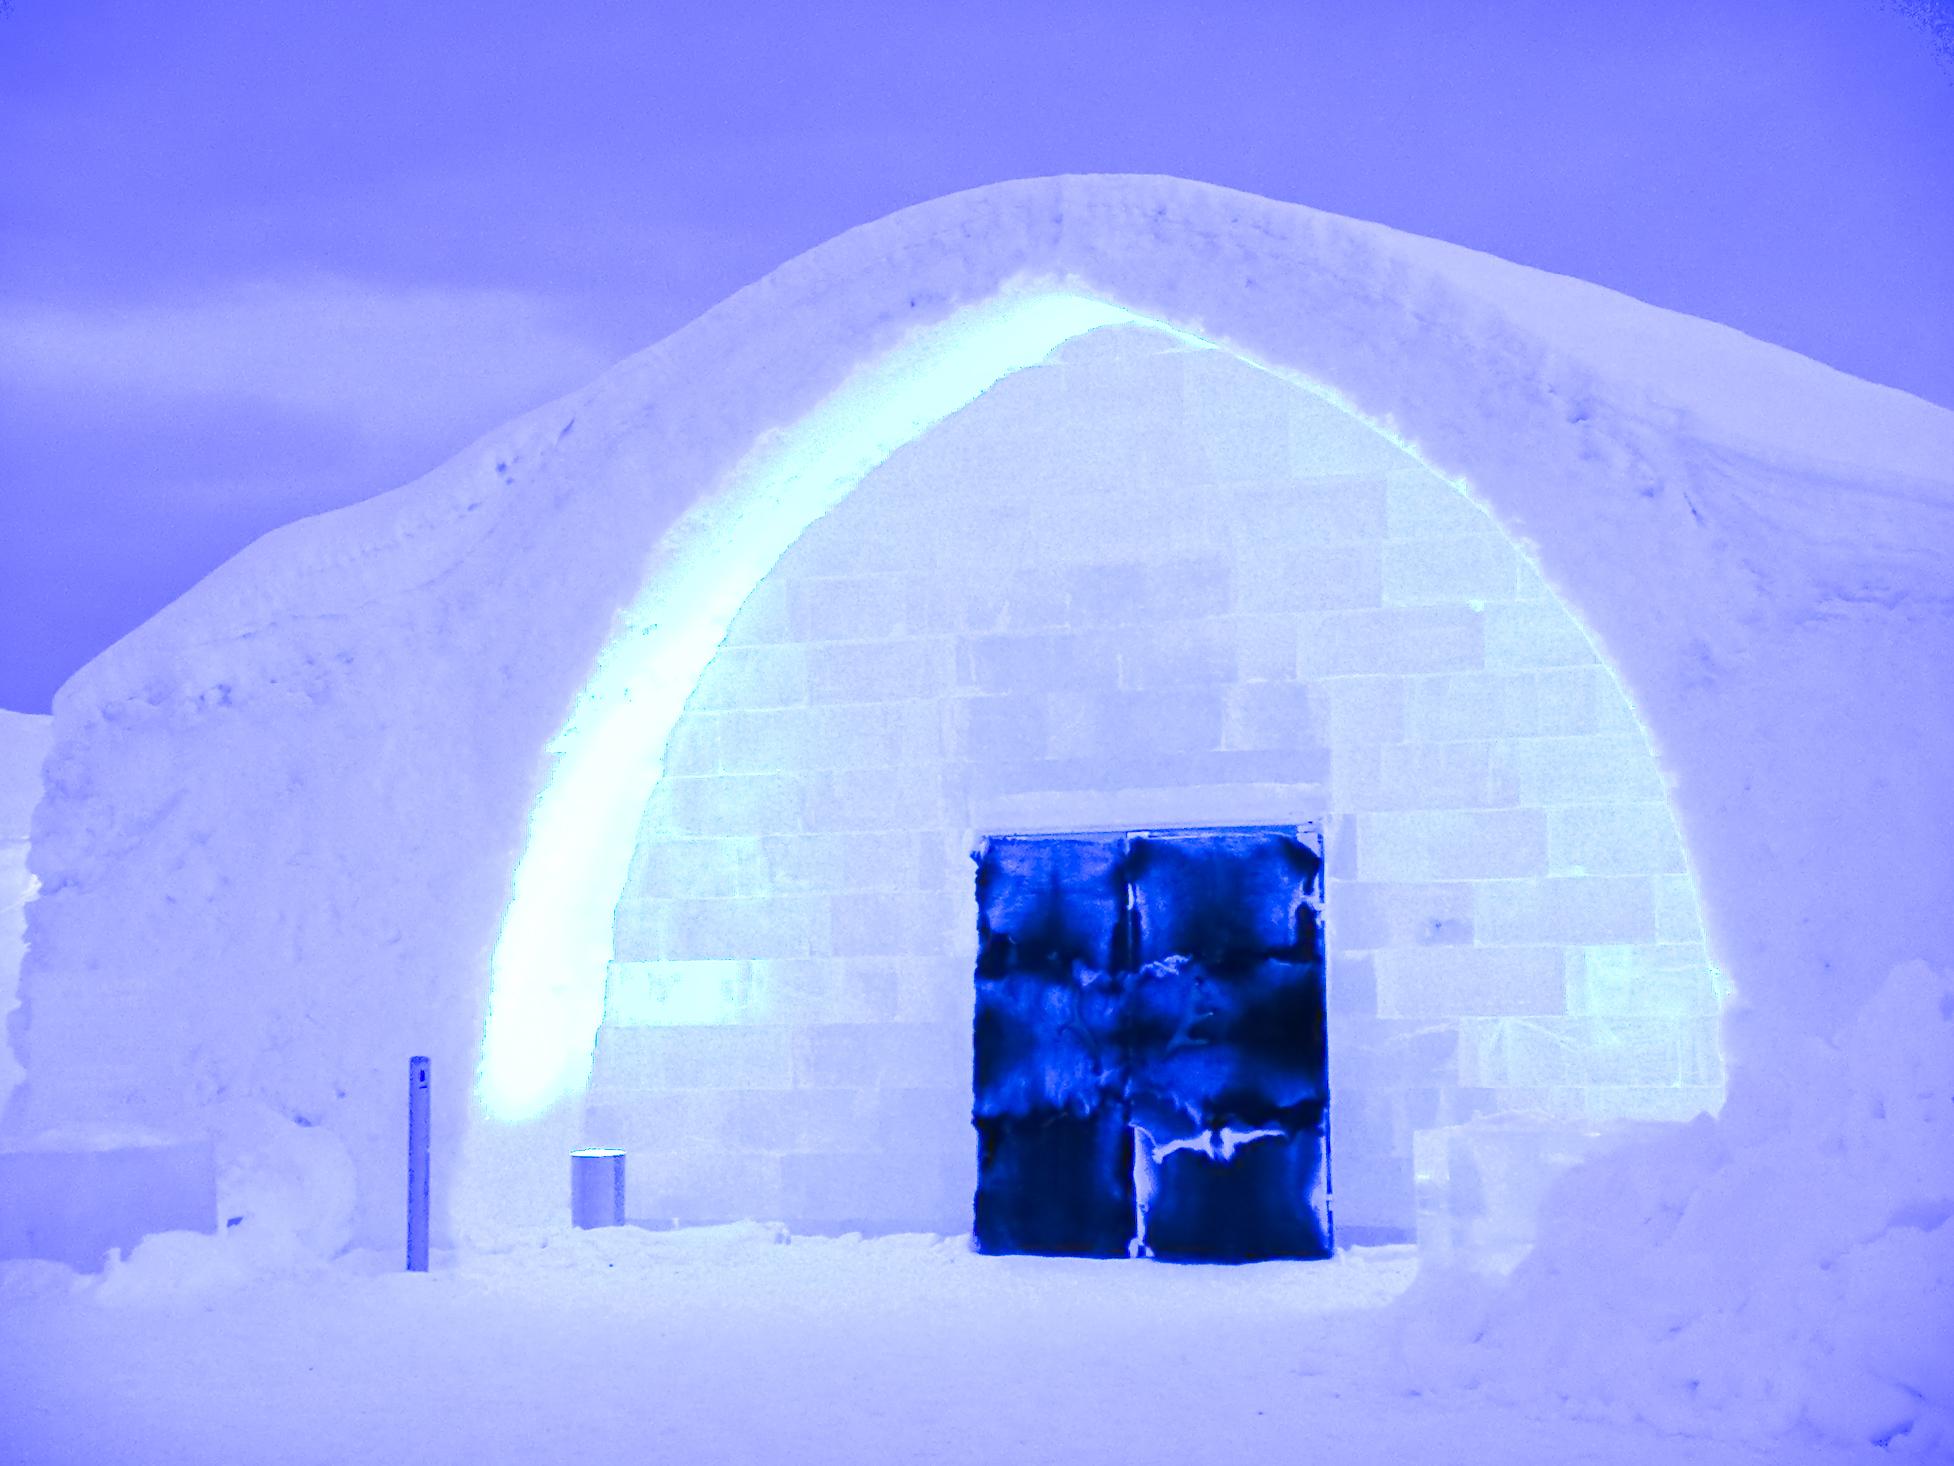 Ice Hotel Entrance 1578968.jpg